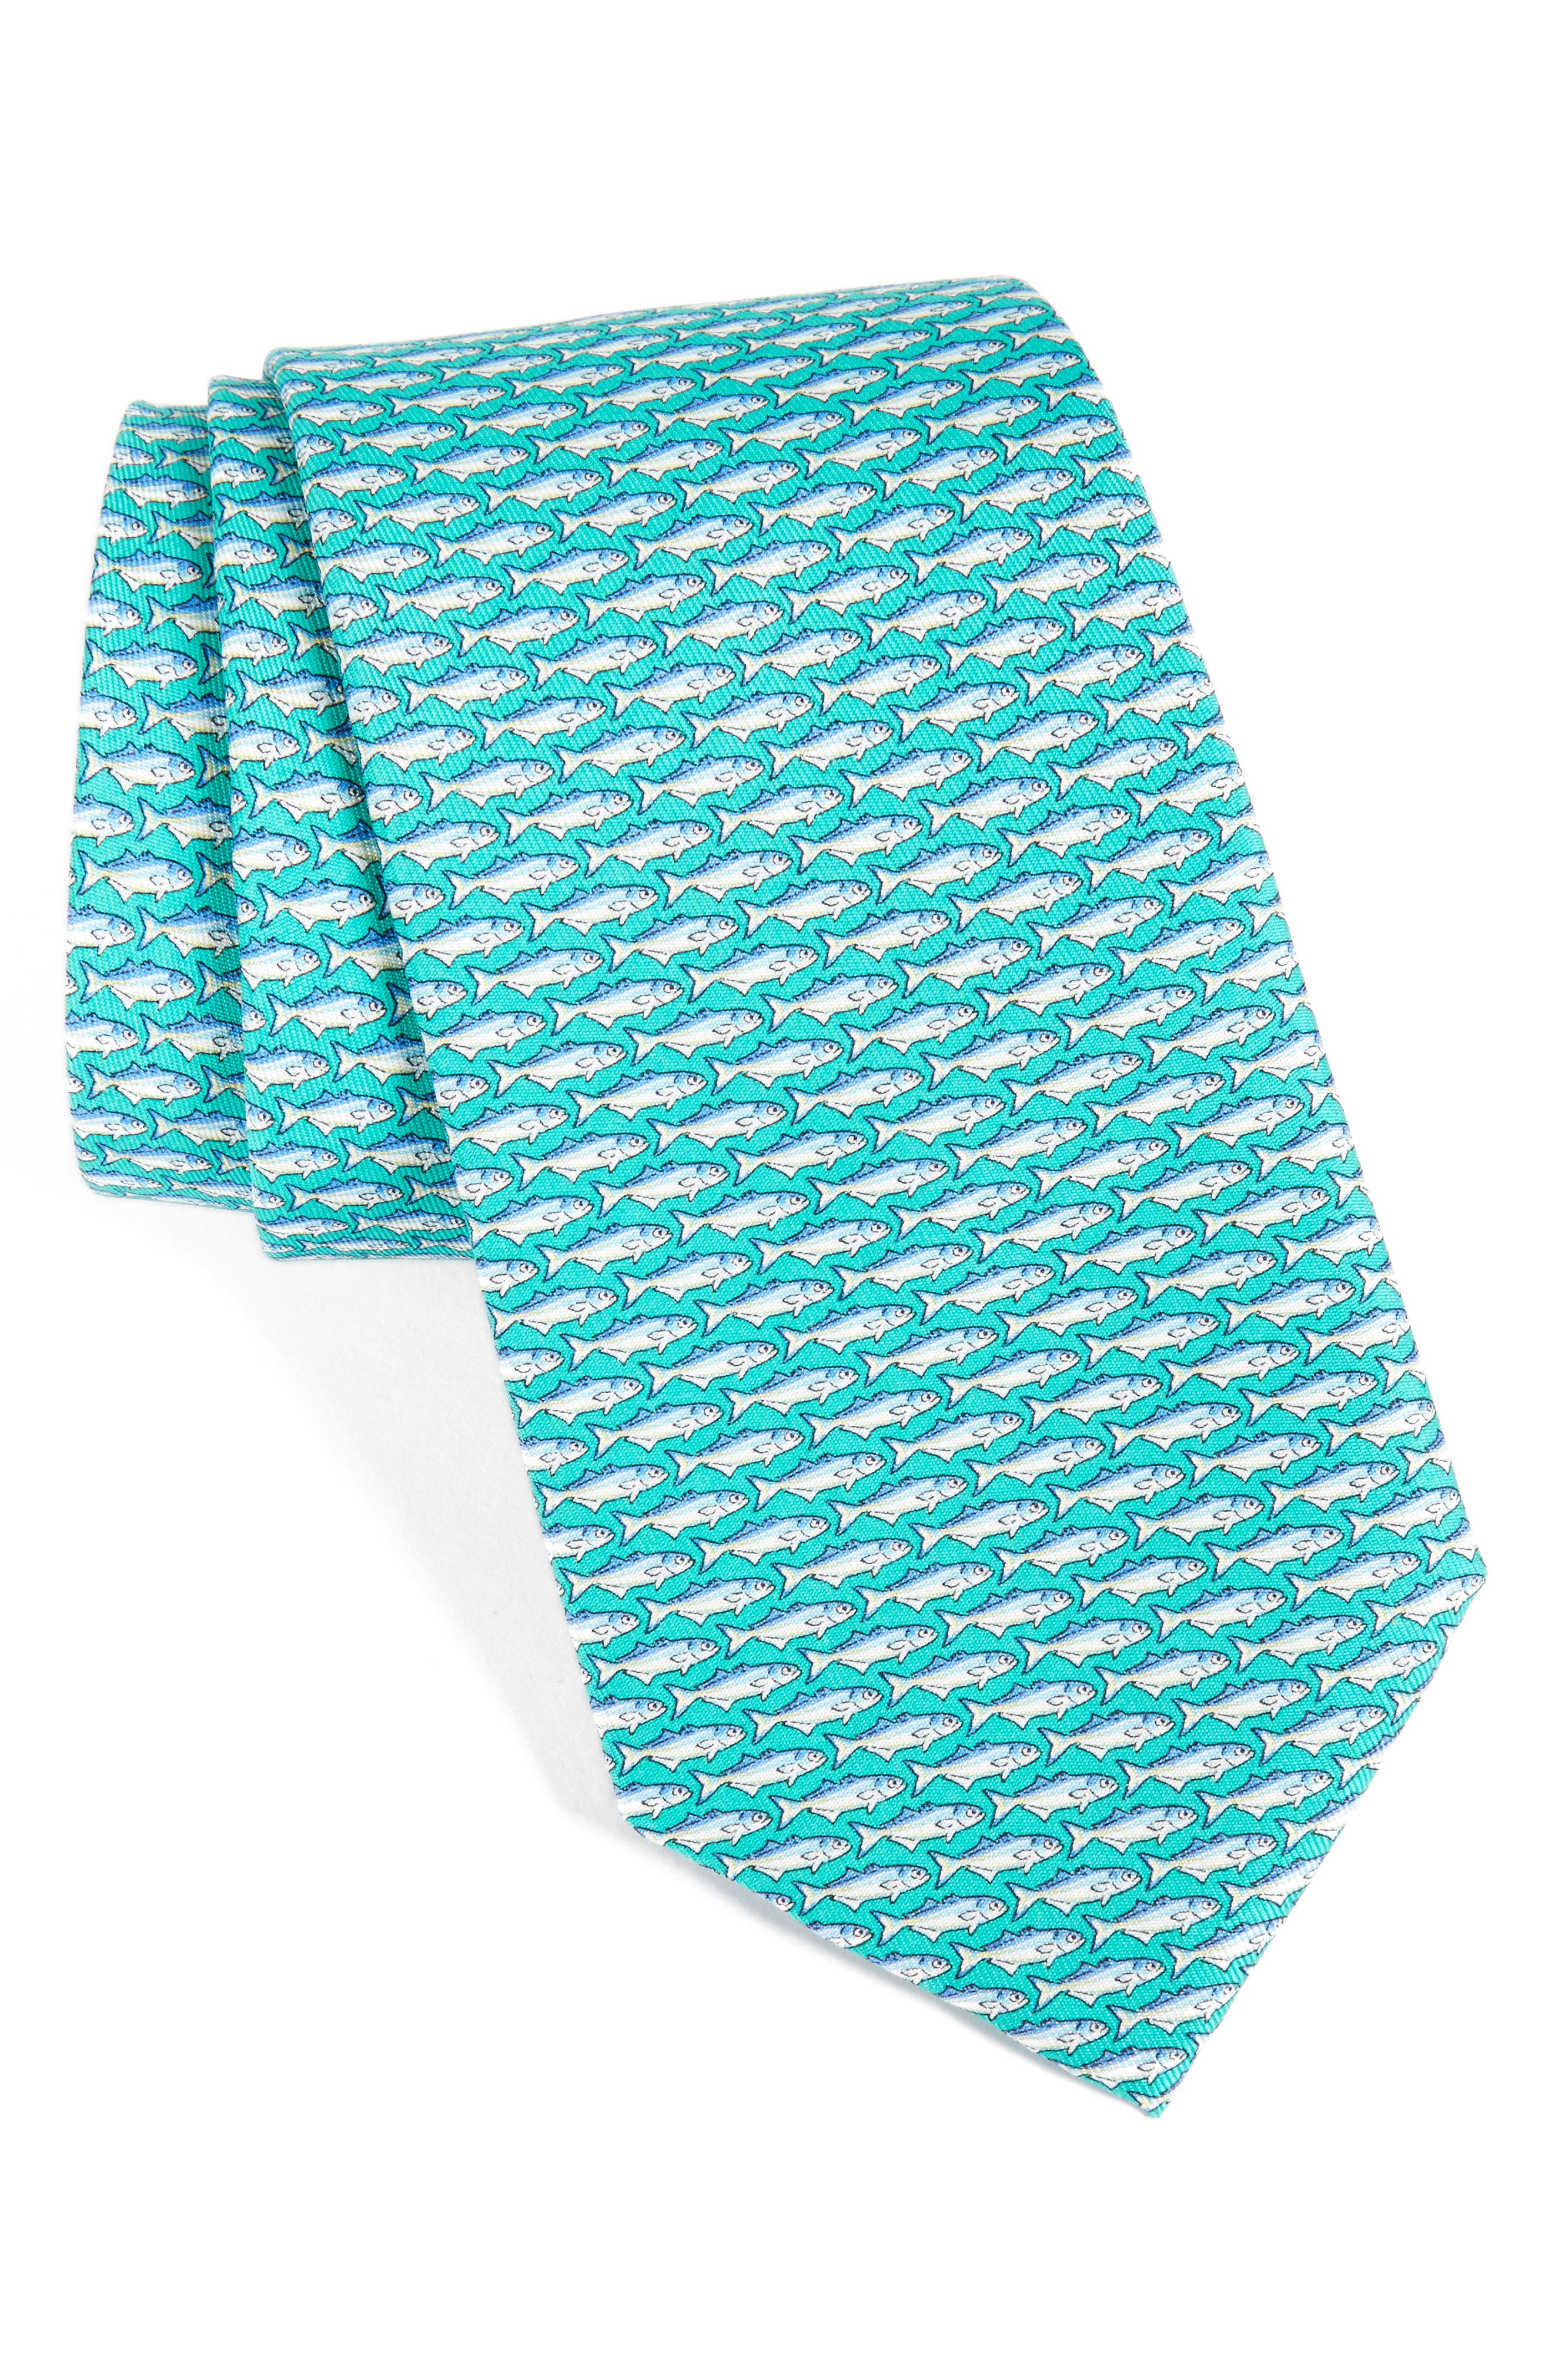 Blue Fish Print Silk Tie,                         Main,                         color, 356